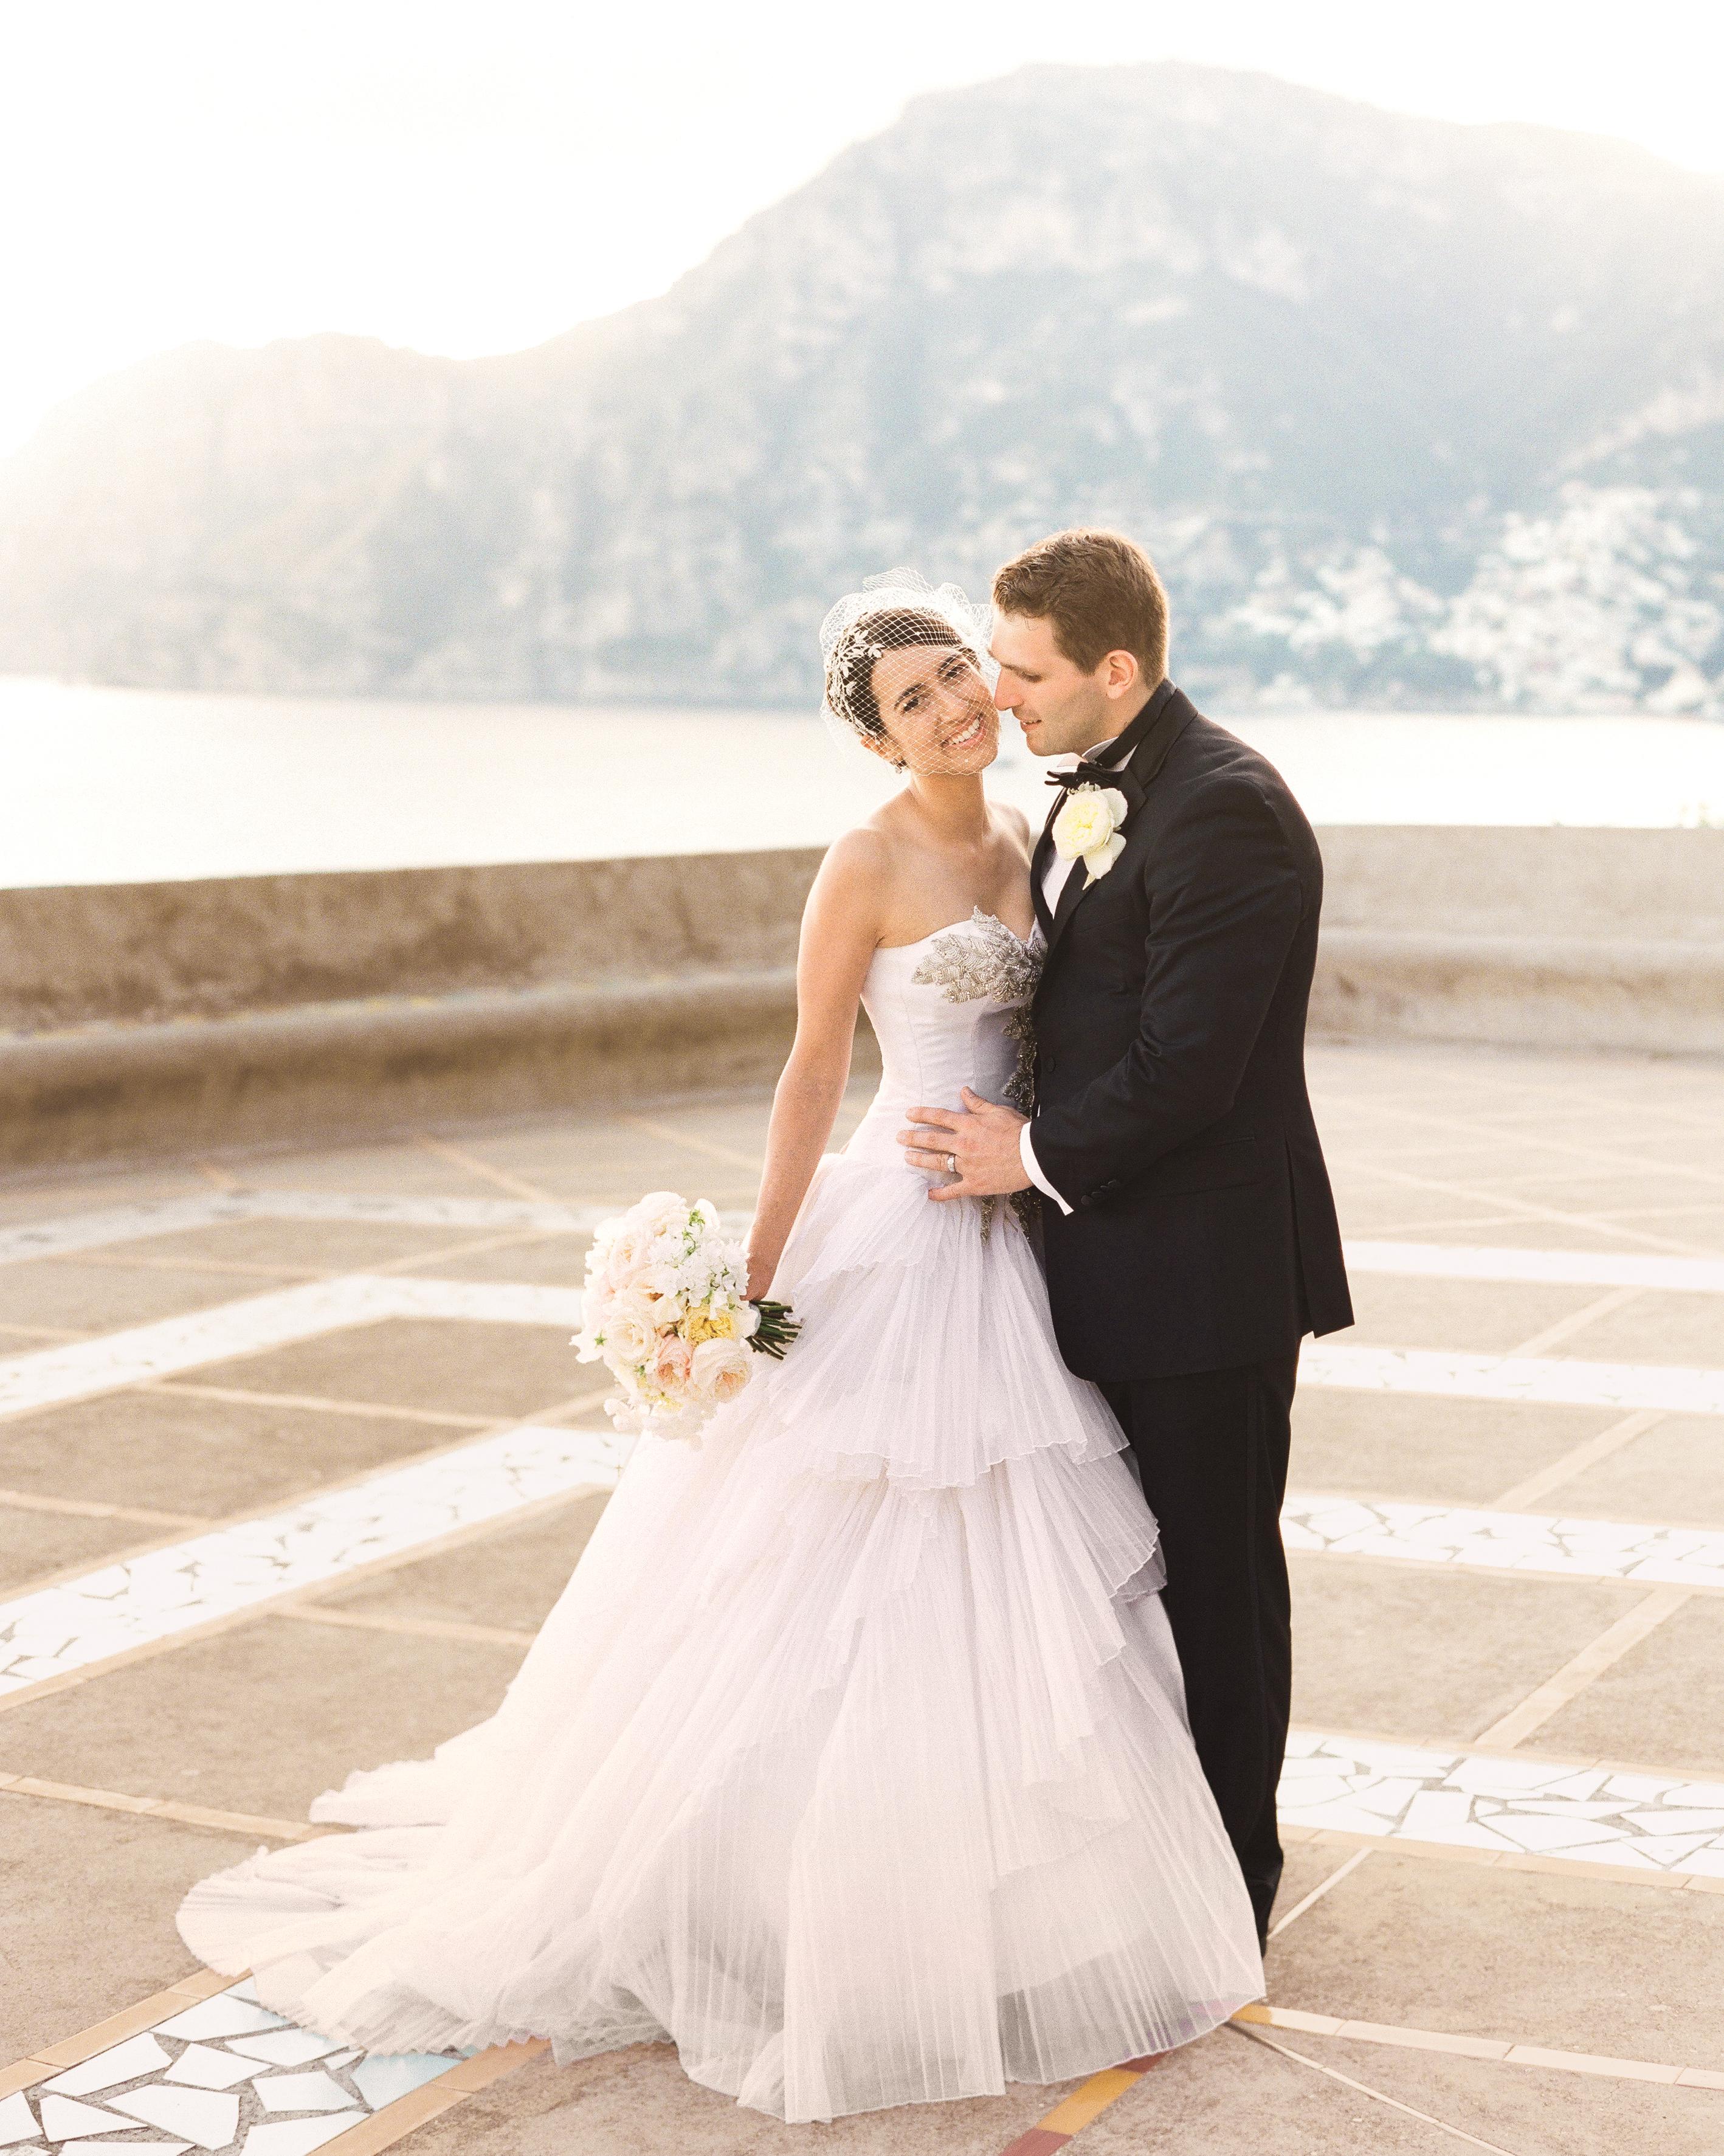 michelle-christopher-positano-bride-groom-0776-s111681.jpg